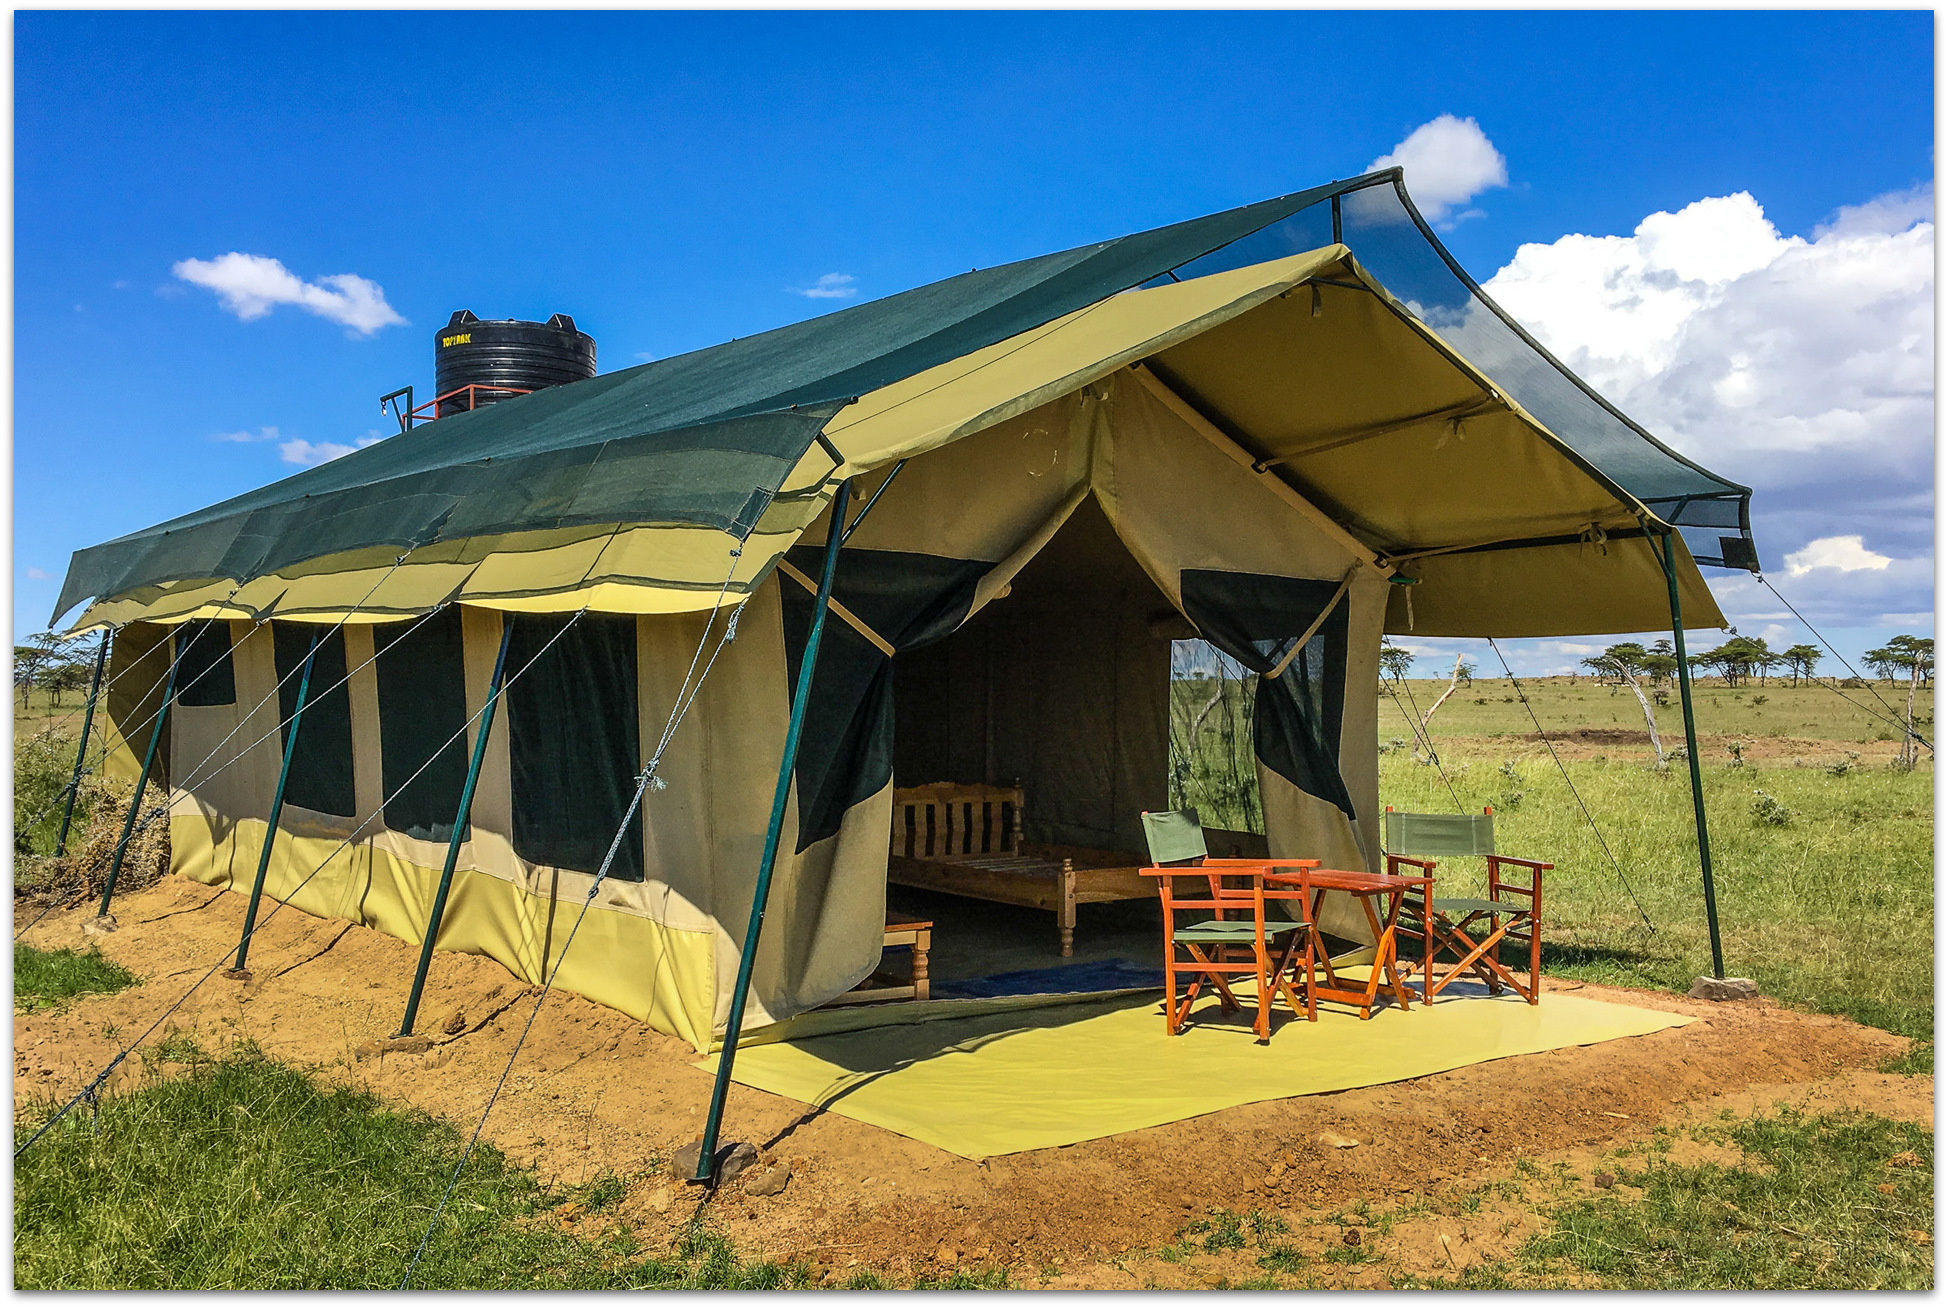 Tent accommodation in the Maasai Mara